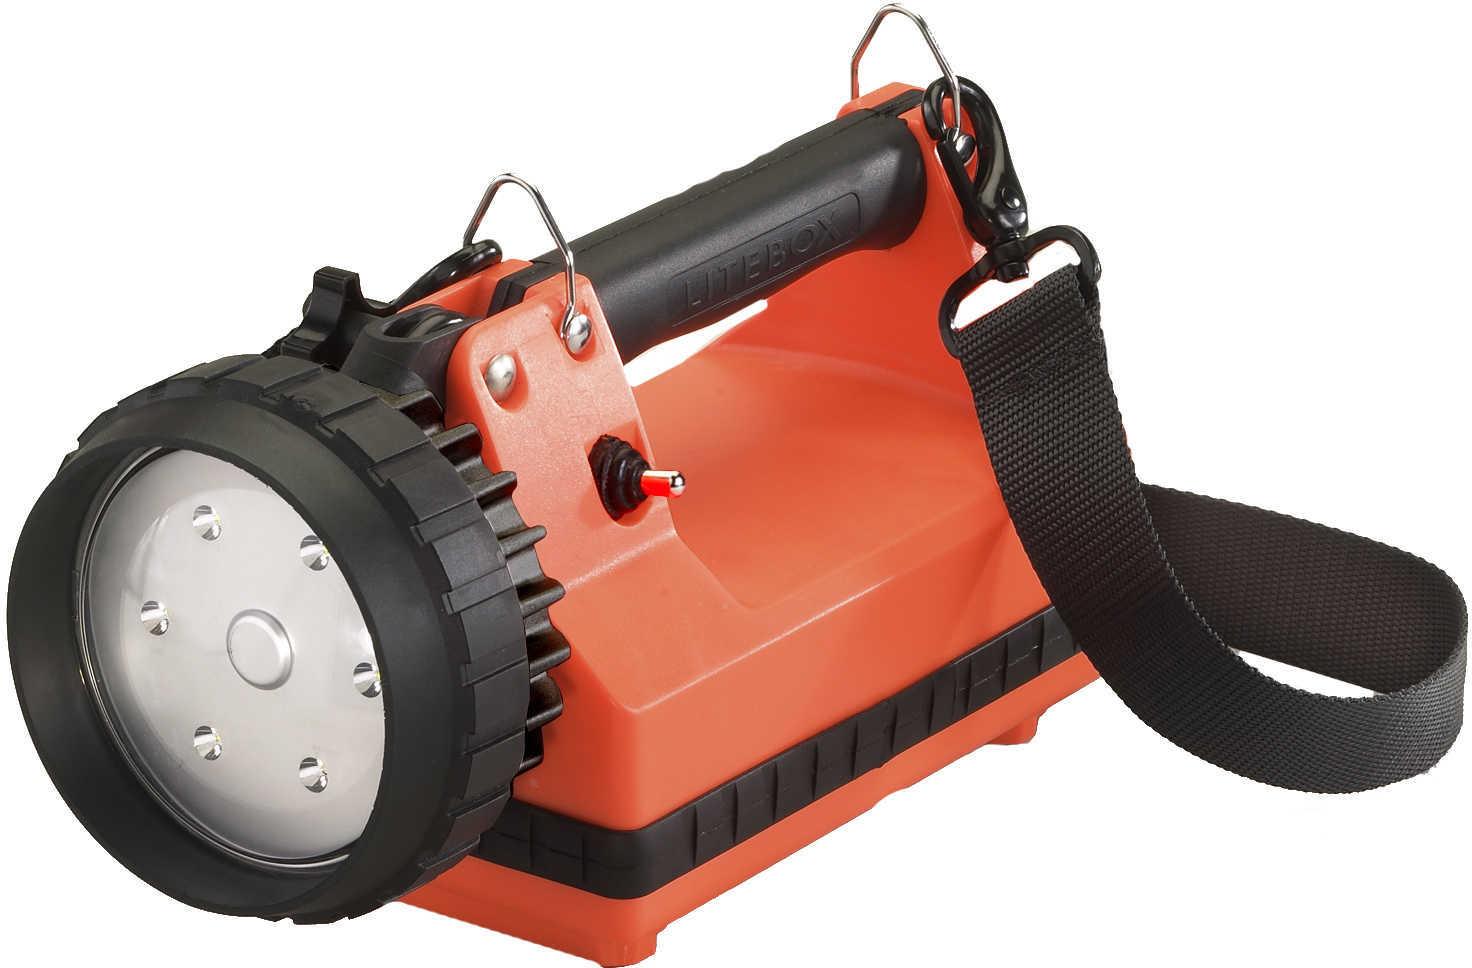 Streamlight E-Flood Firebox Vehicle Mount System, Orange Md: 45815